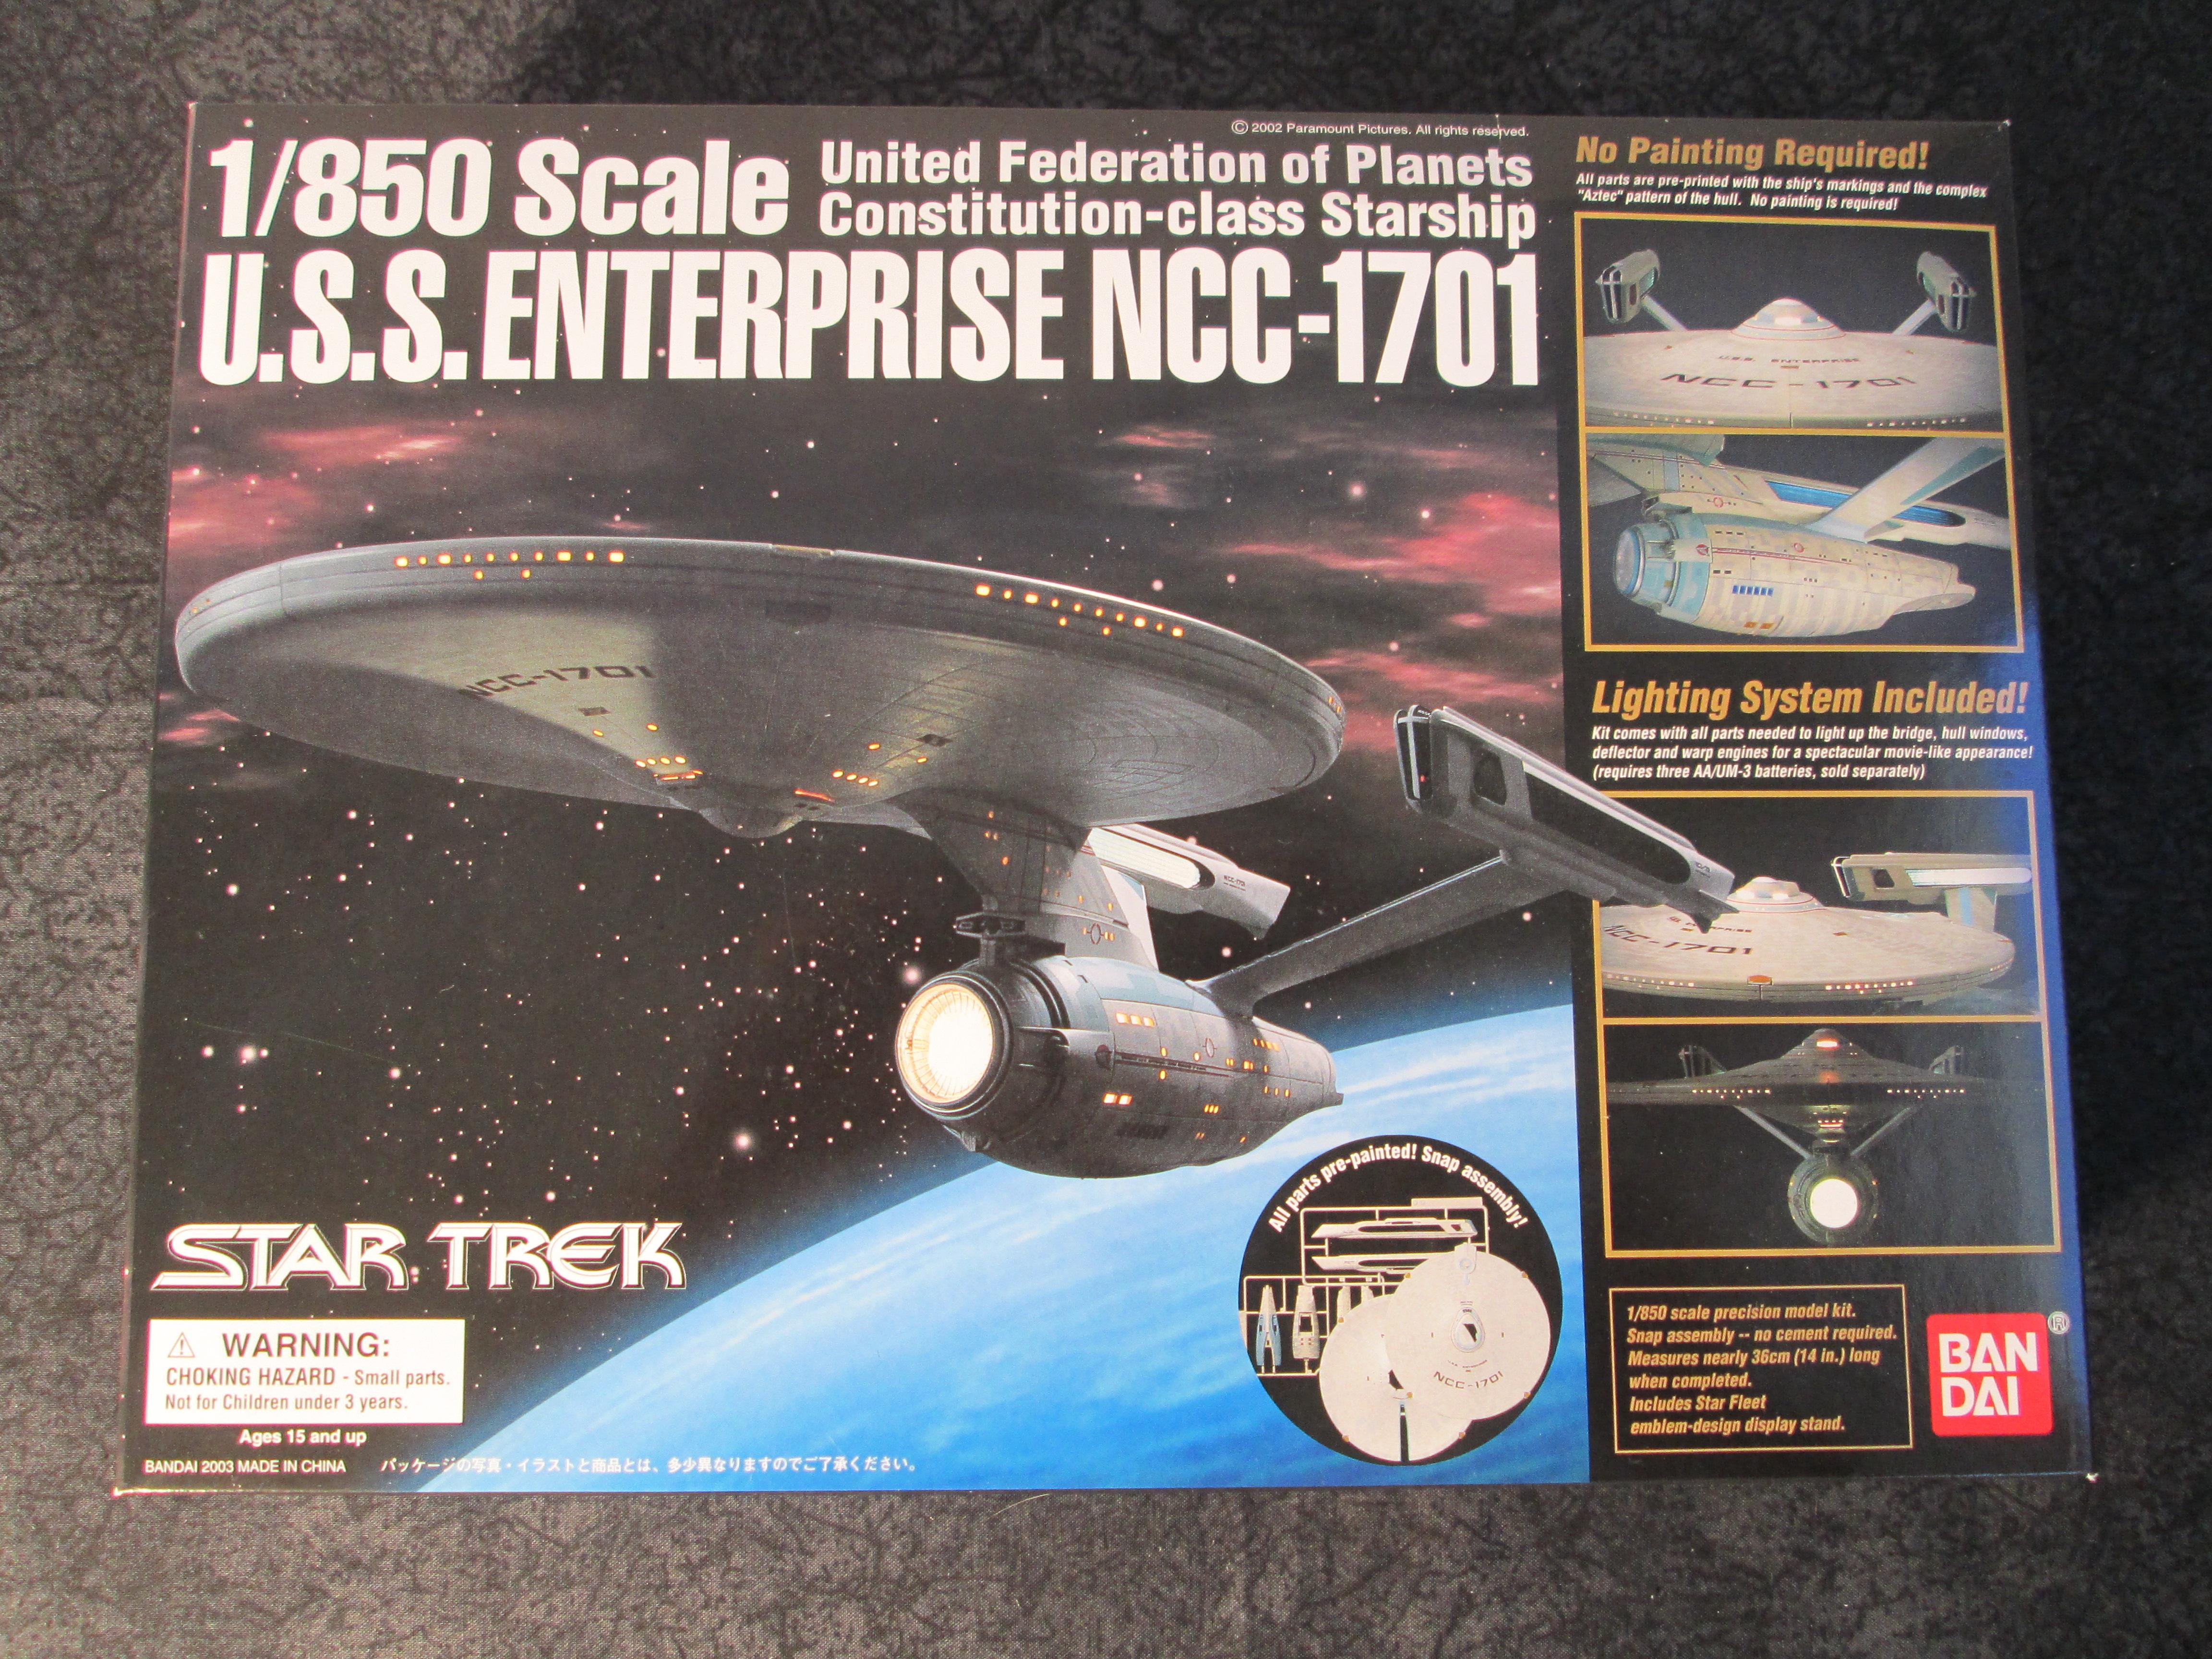 Ban Dai Star Trek 1 850 Scale Lighted U S S Enterprise